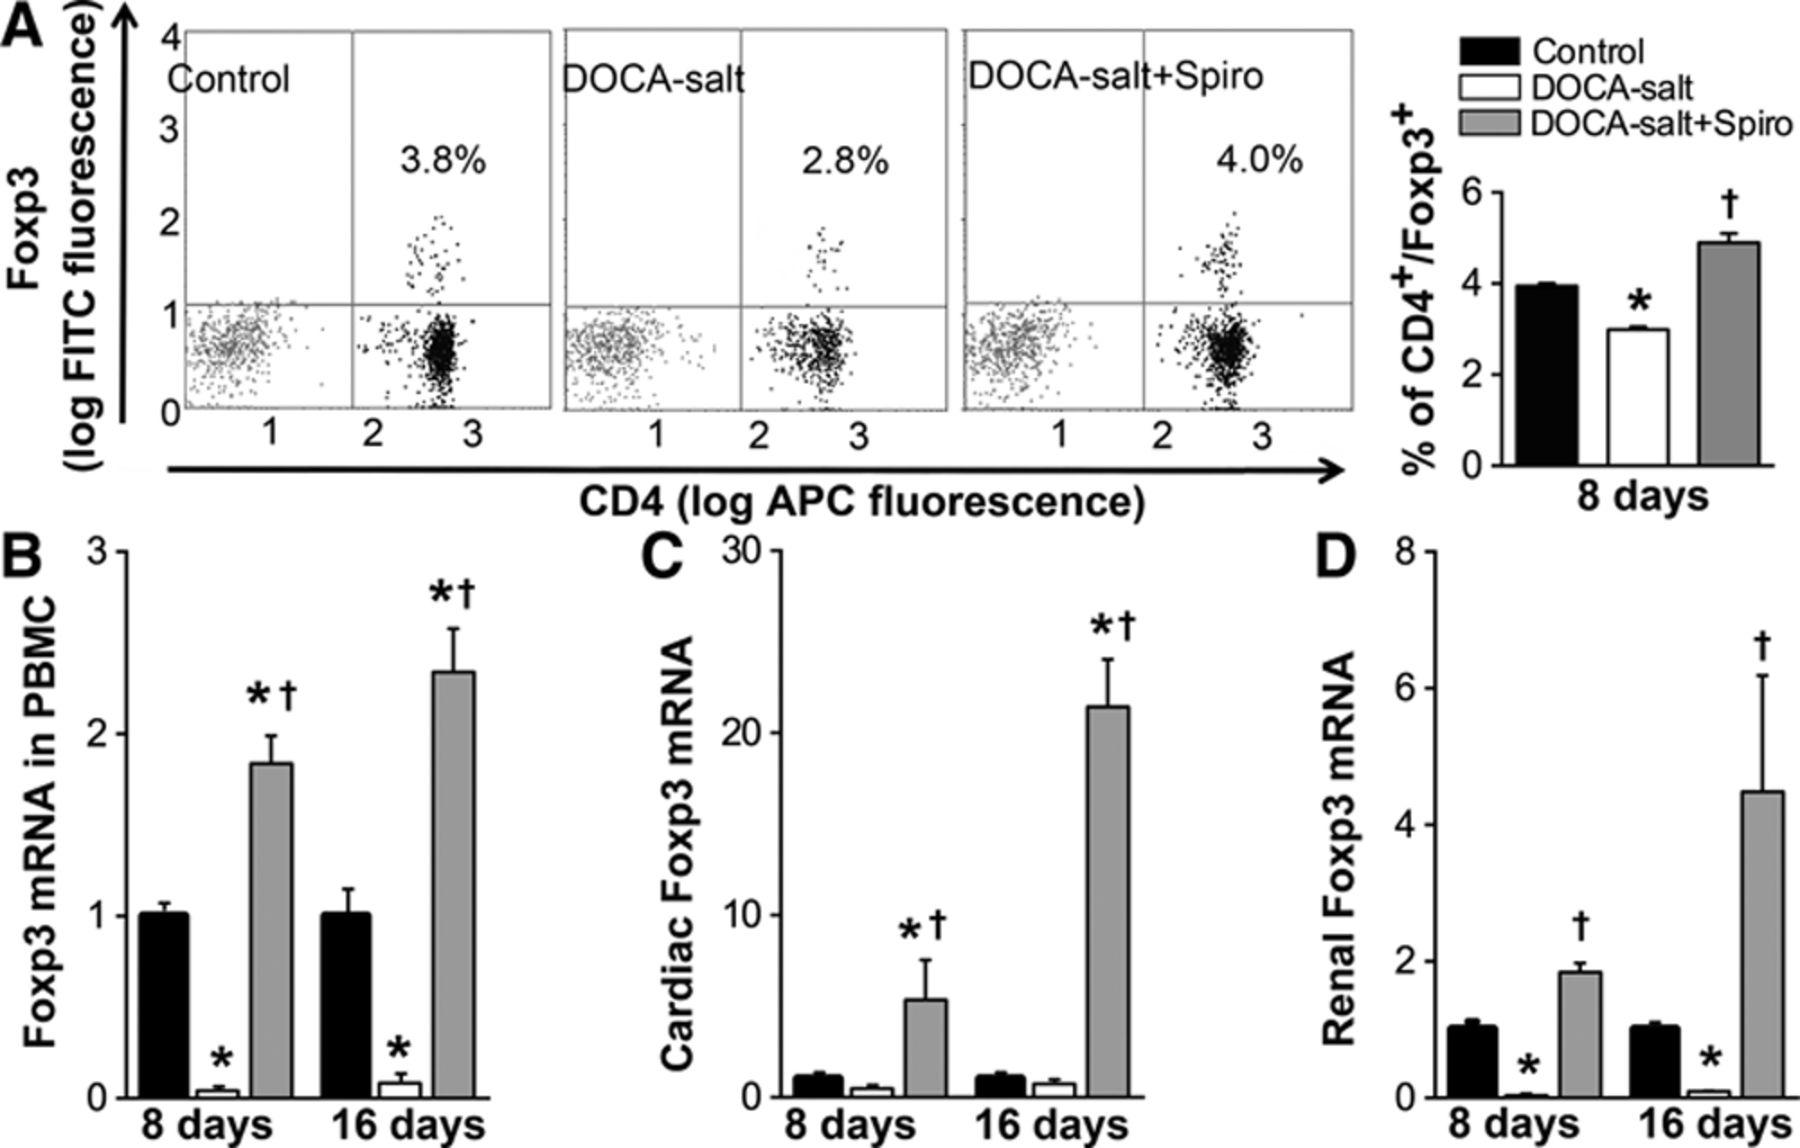 Spironolactone Decreases Doca Salt Induced Organ Damage By